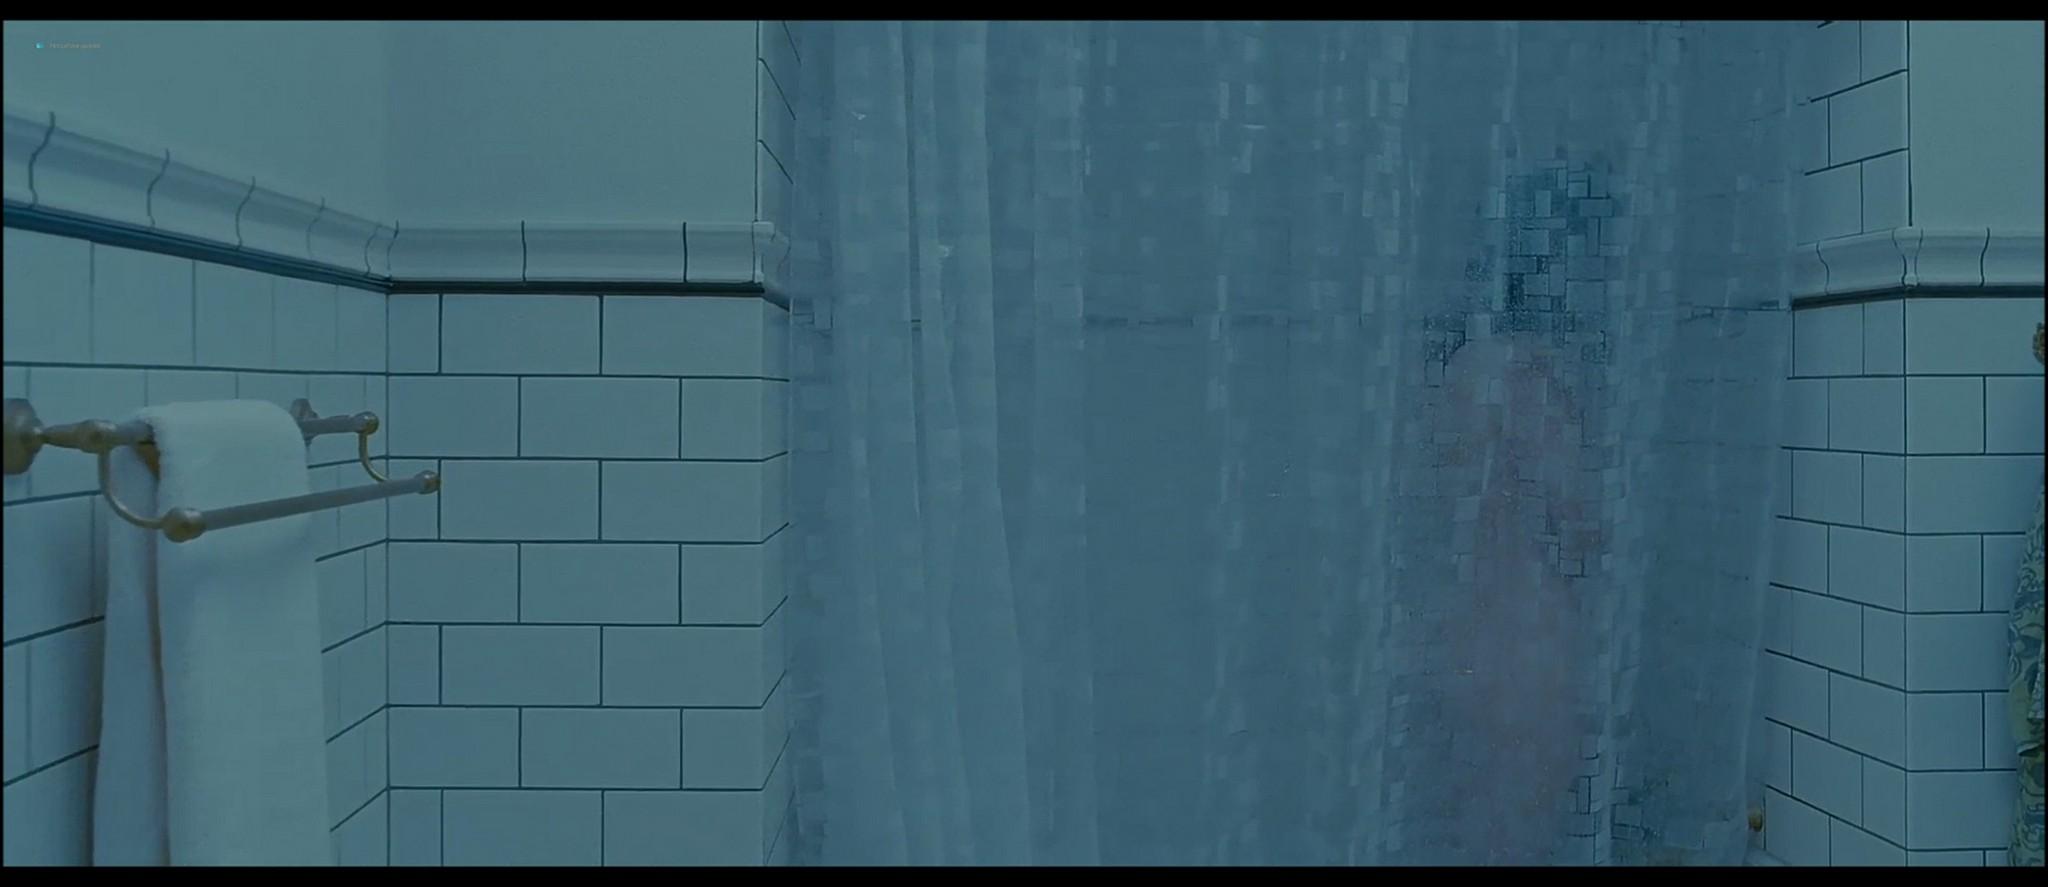 Mia Wasikowska nude nipple peak and butt while masturbating nude in the shower - Stoker (2013) HD 1080p BluRay (9)